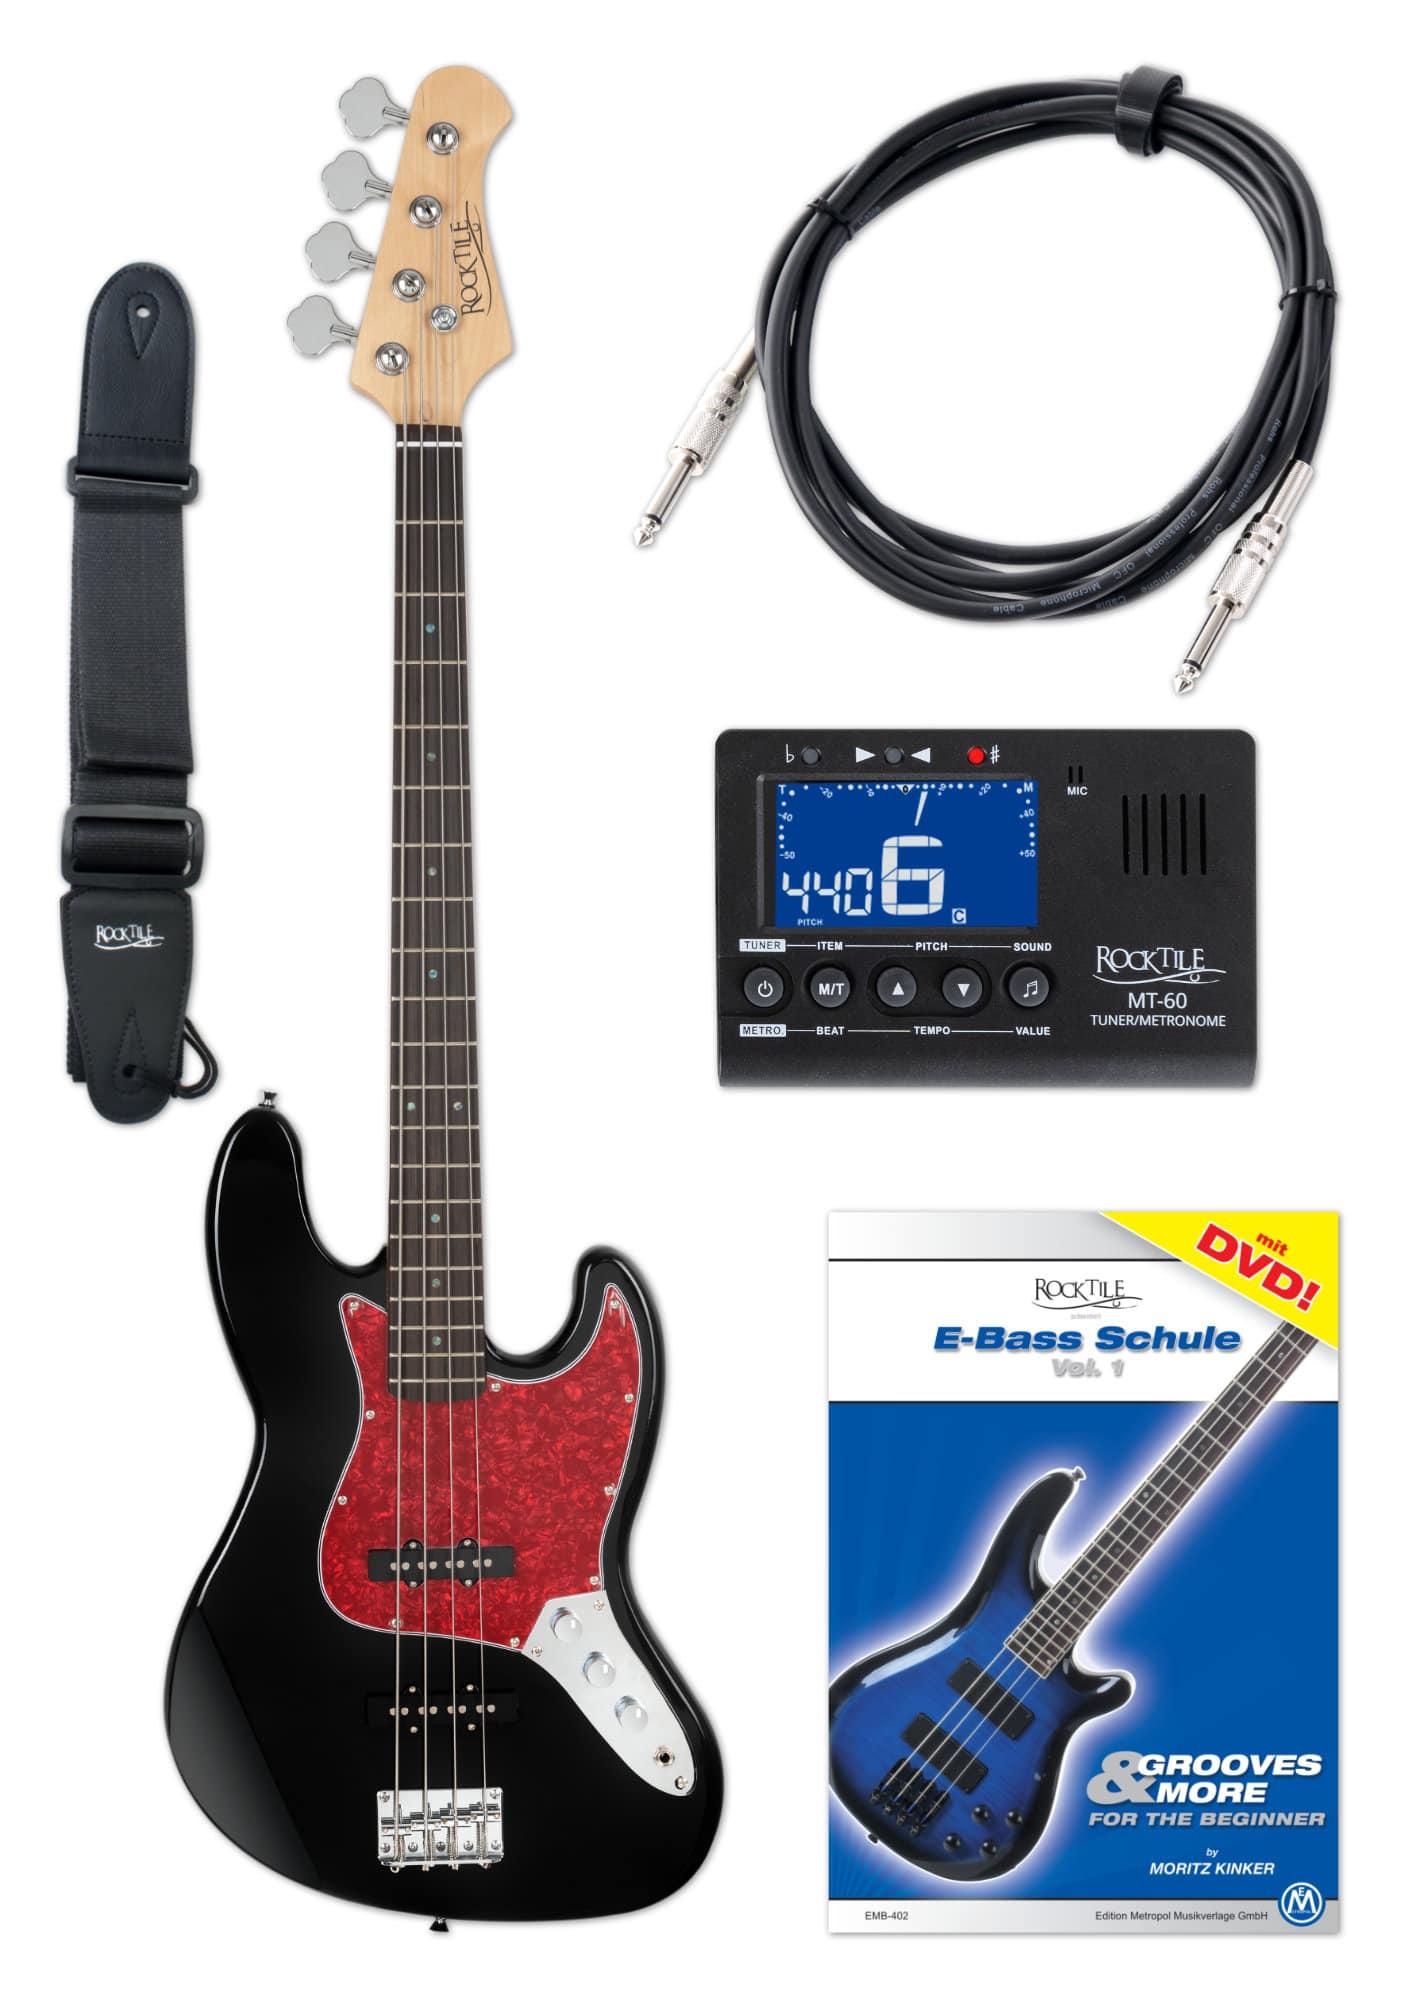 Ebaesse - Rocktile Pro JB 30BK 70s Deluxe E Bass Set Schwarz - Onlineshop Musikhaus Kirstein